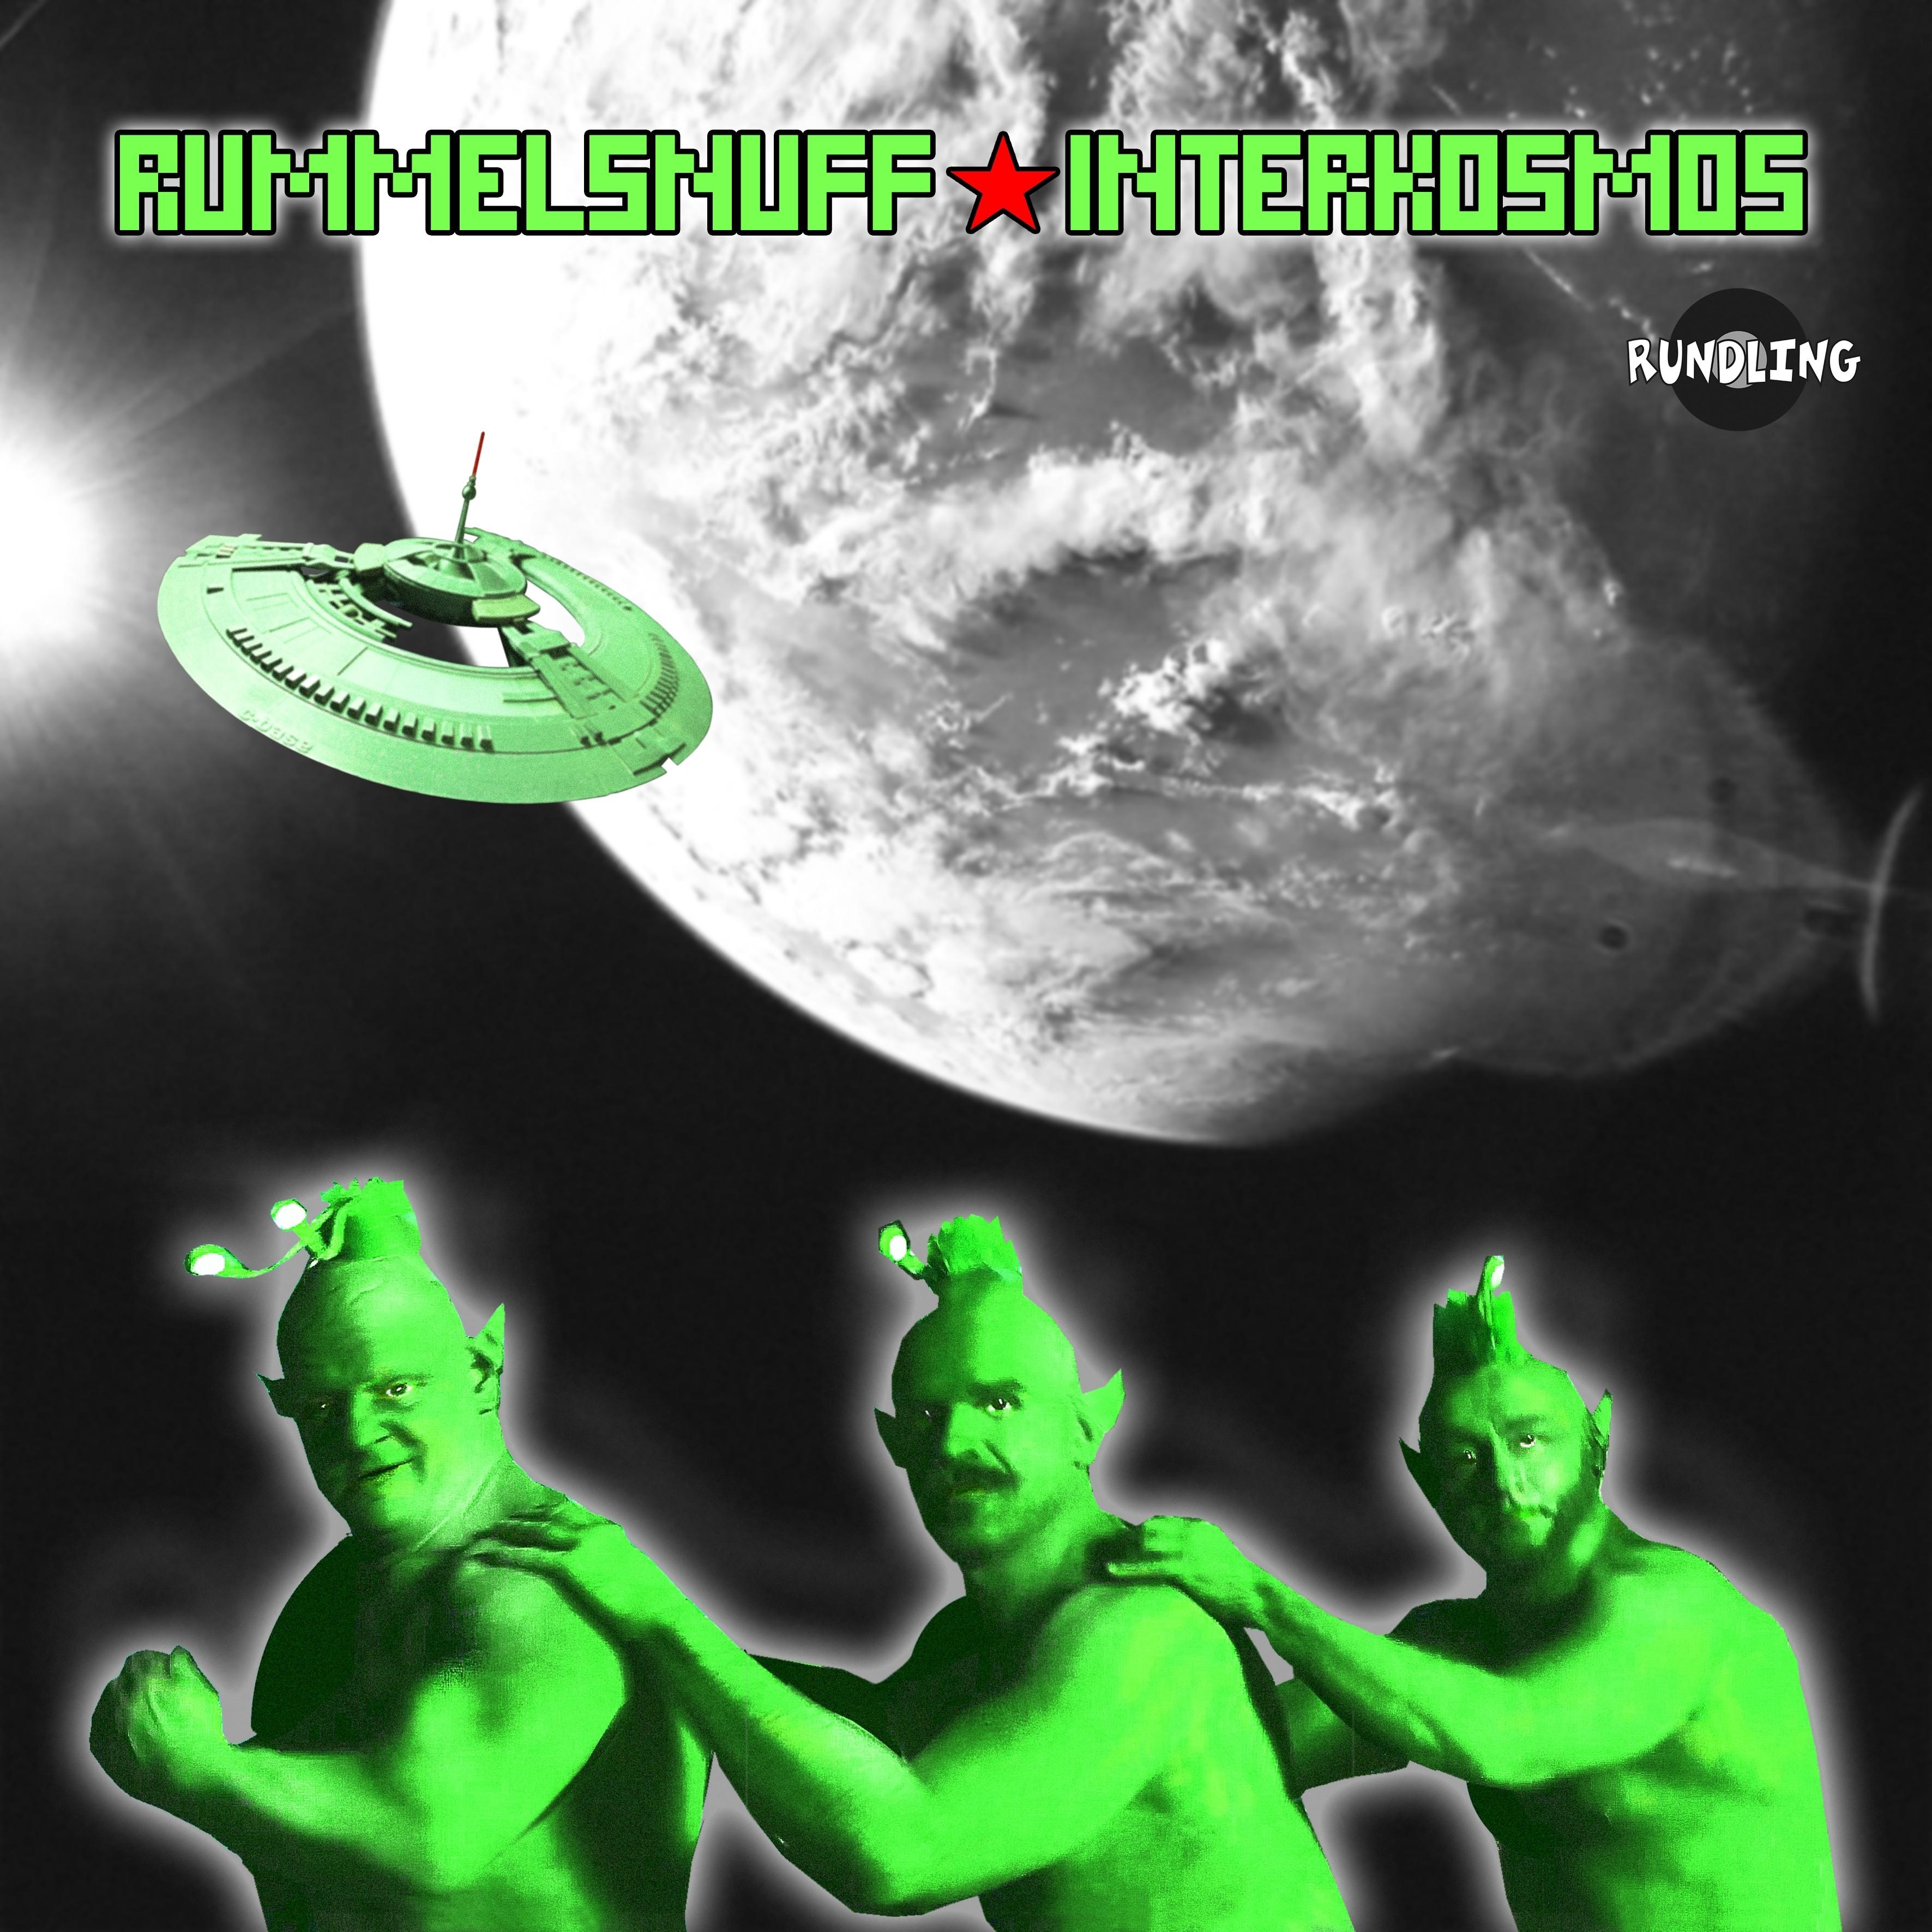 Rummelsnuff - Interkosmos - Rummelsnuff - Interkosmos